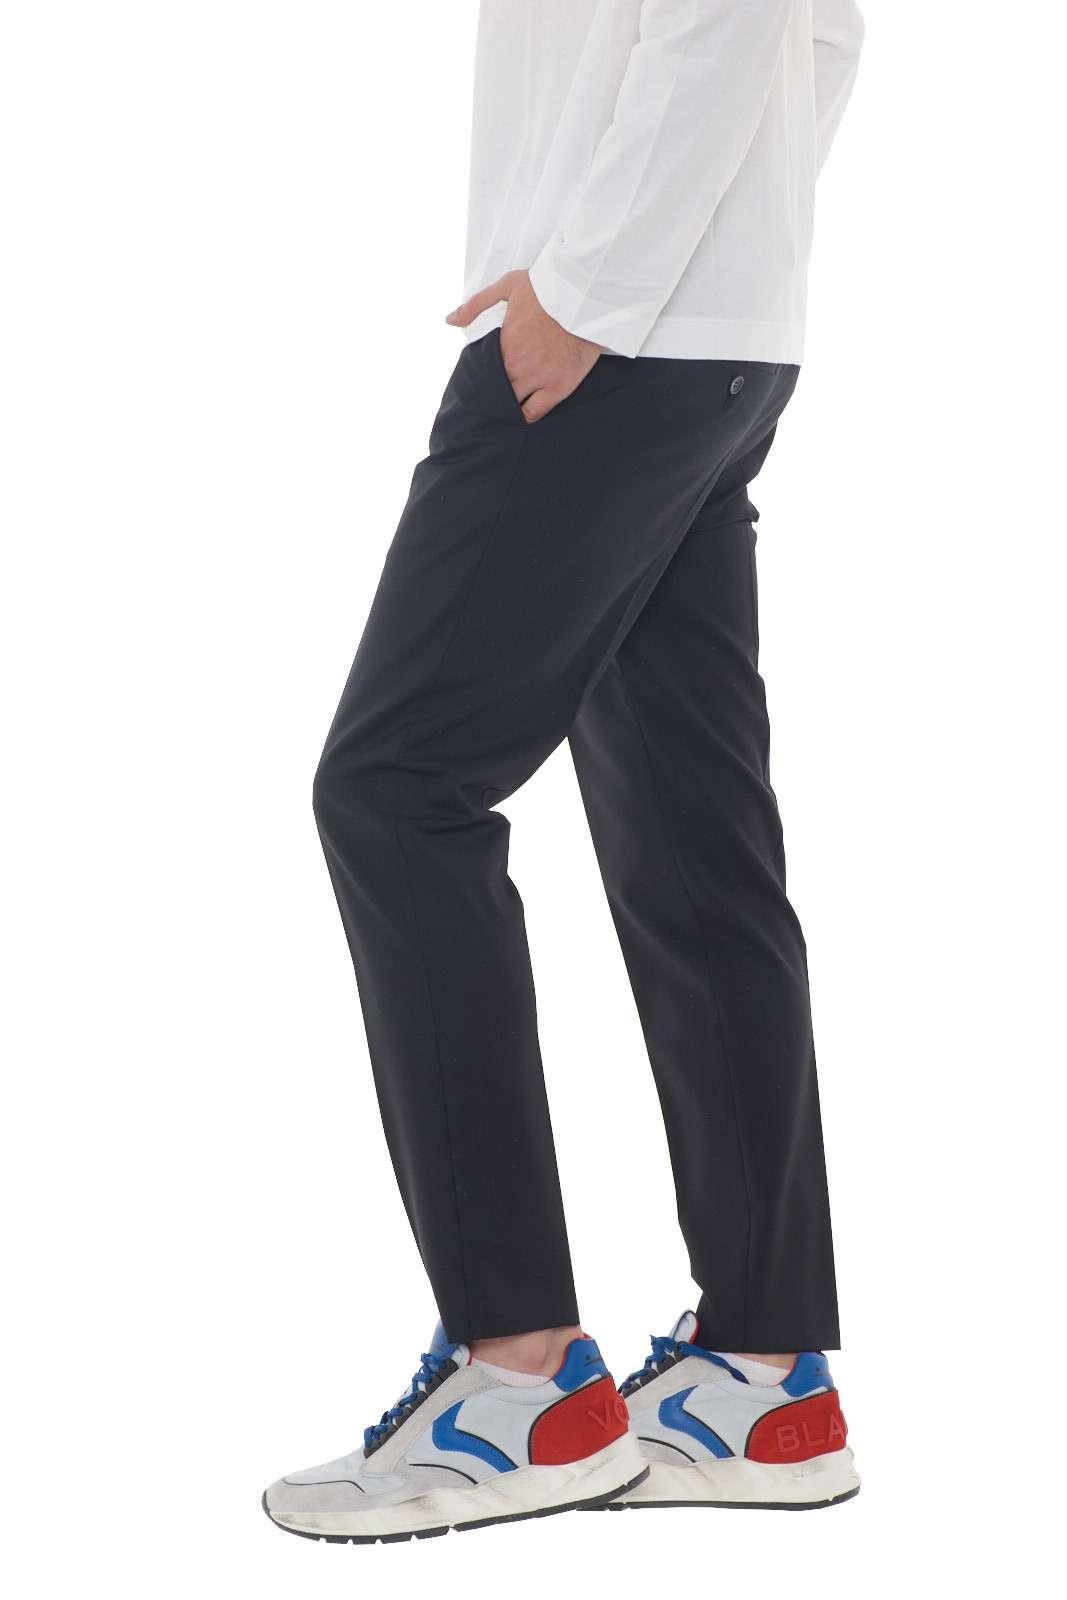 https://www.parmax.com/media/catalog/product/a/i/AI-outlet_parmax-pantaloni-uomo-Calvin-Klein-K10K104263-B.jpg